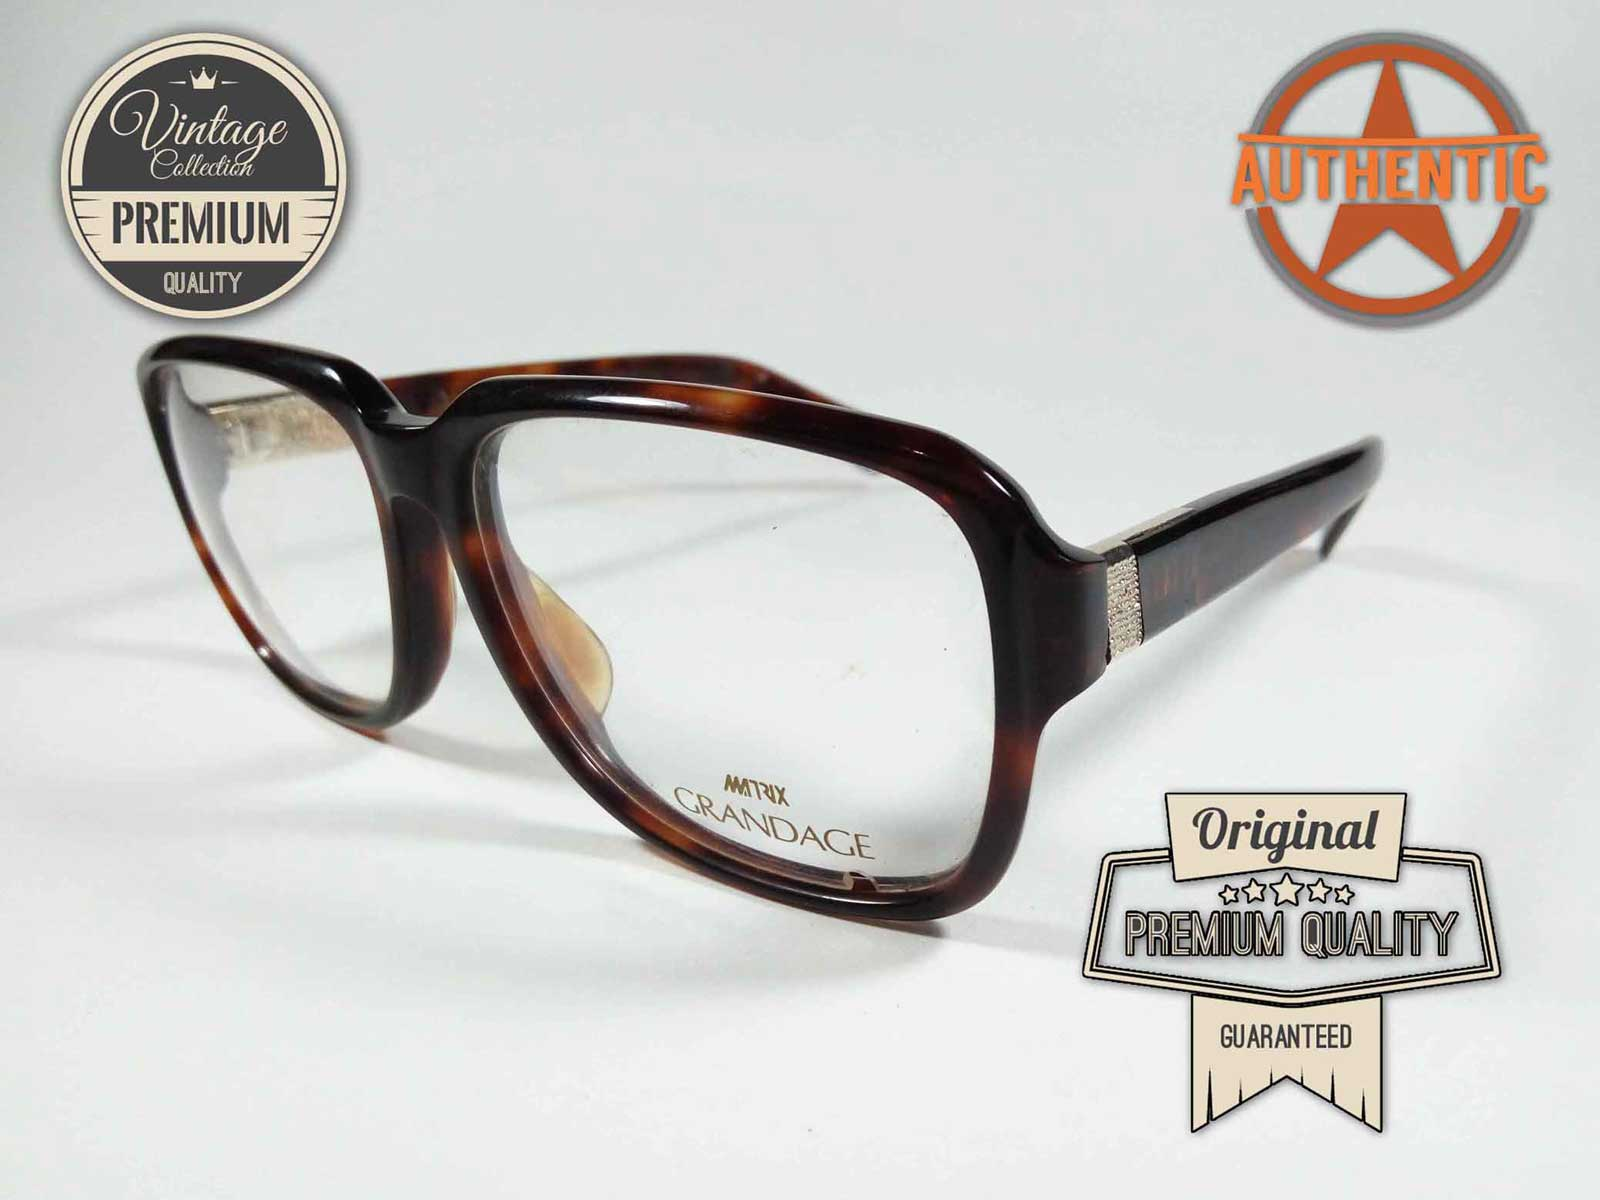 Frame Kaca Mata Dg1617 Daftar Harga Terlengkap Indonesia Kacamata Minus Kotak Terlaris Casual Baca Fashion Nagita Source Vintage Square